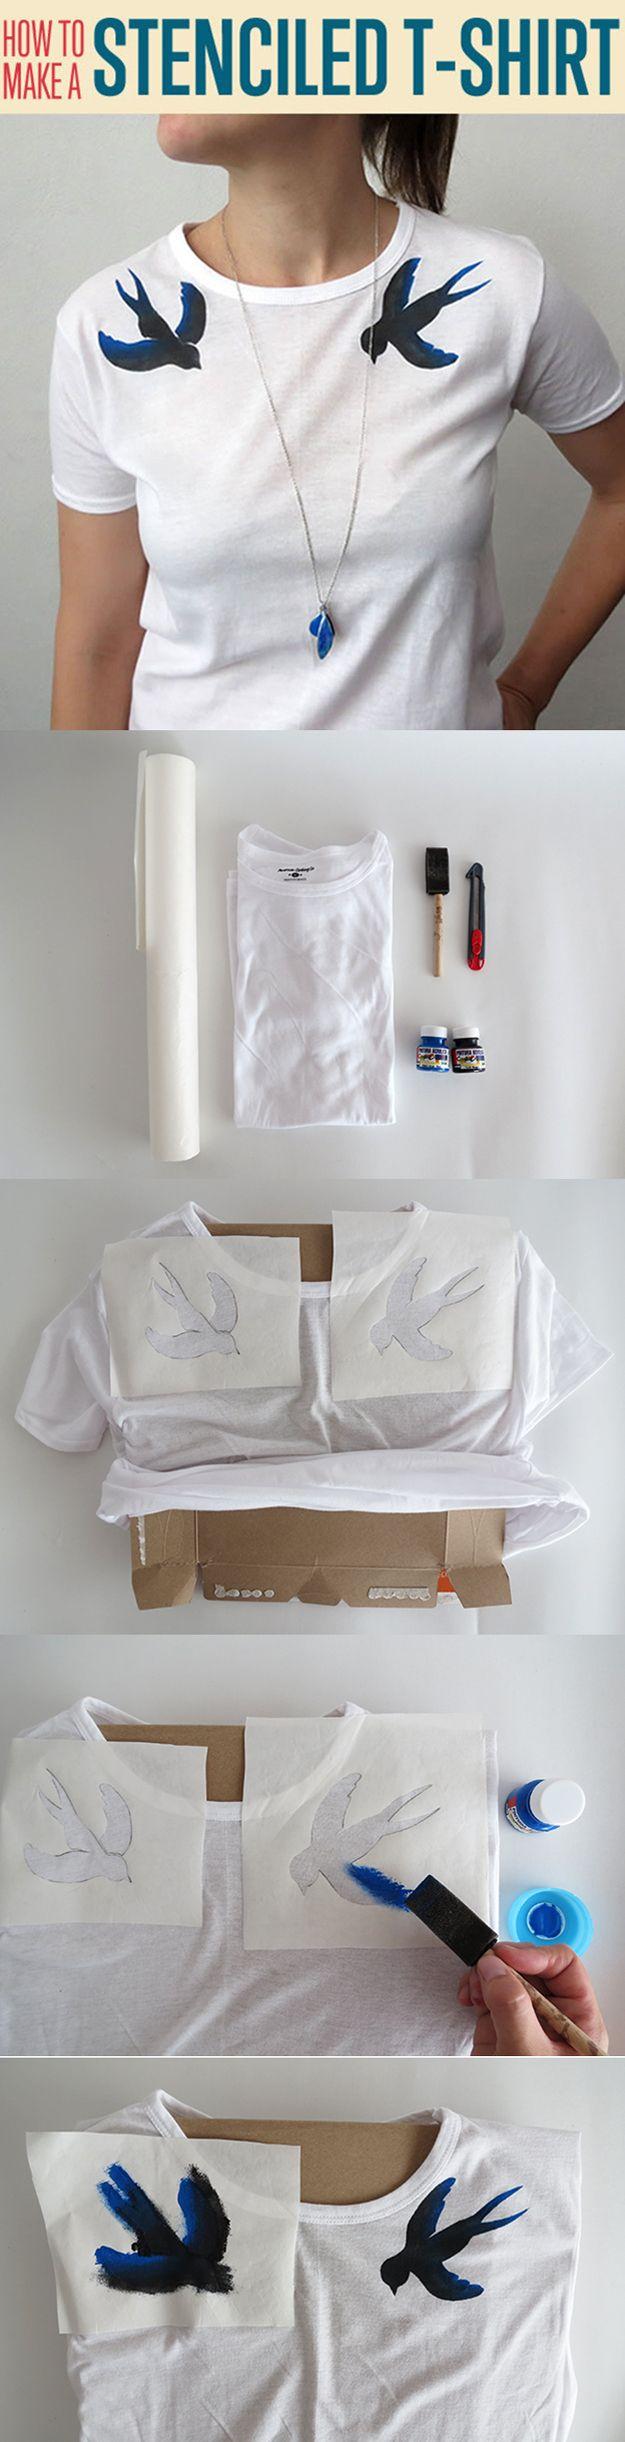 Camisa estarcida